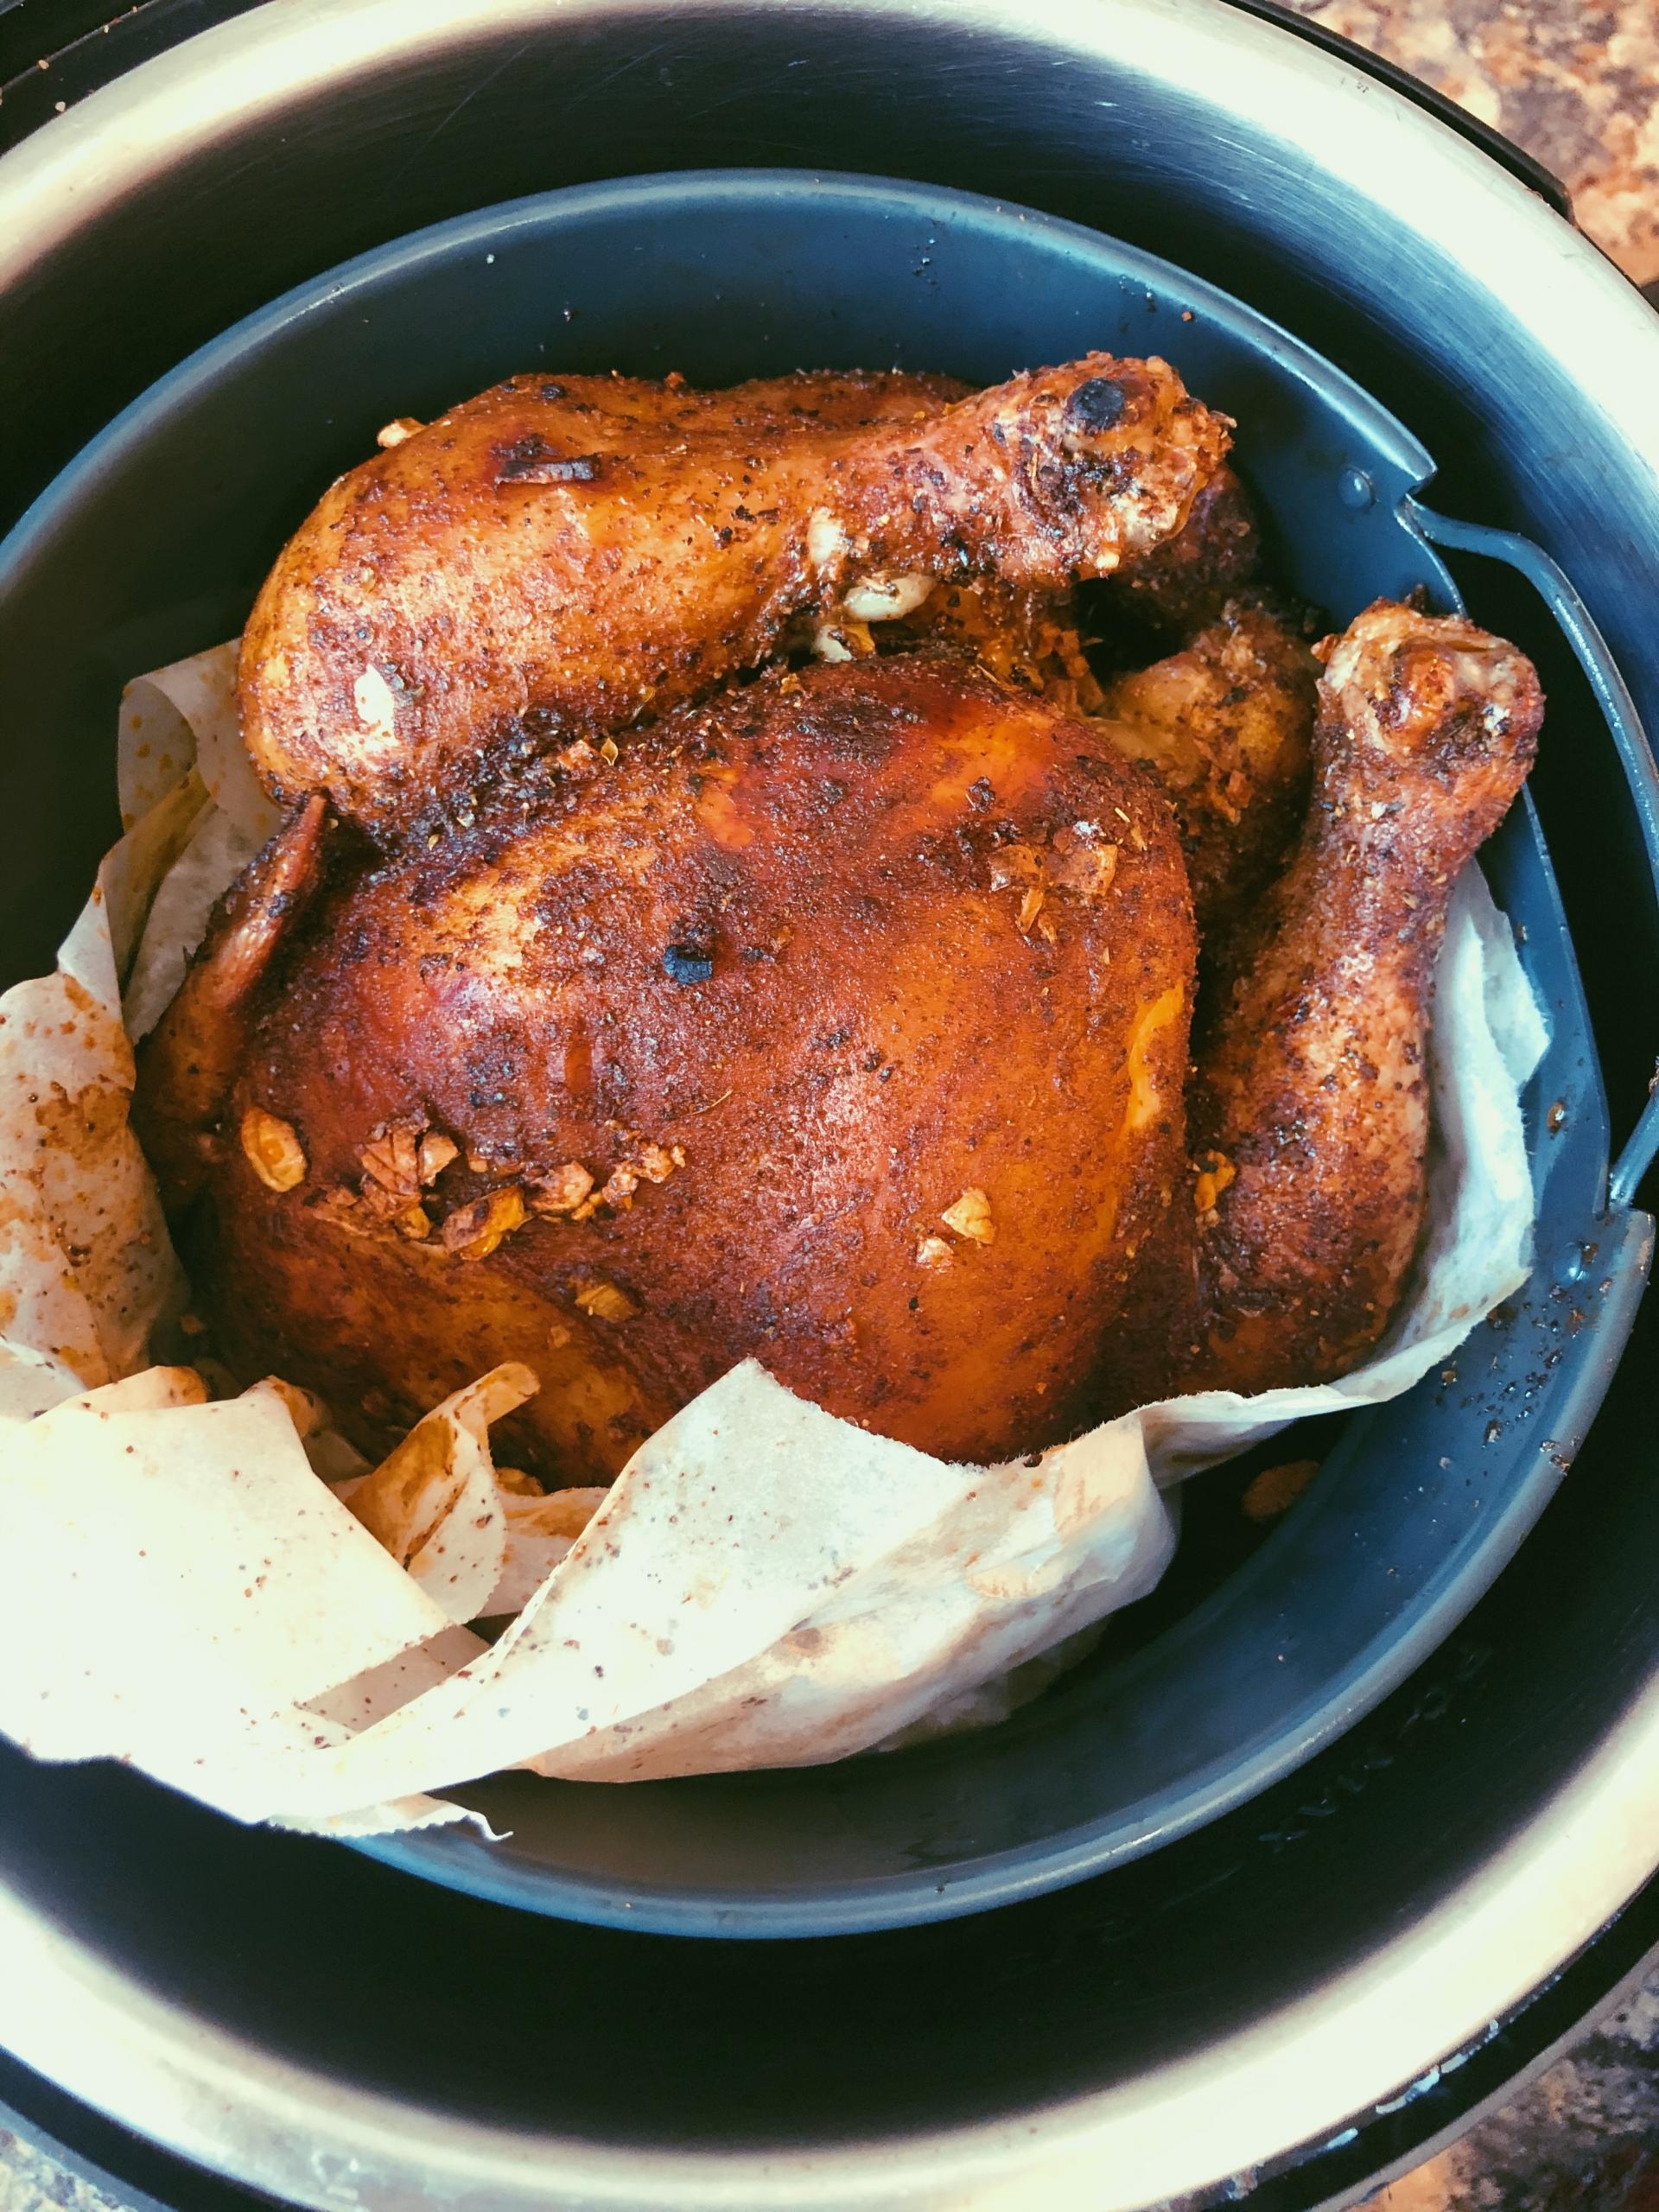 air fryer whole roasted chicken grain free, scd diet